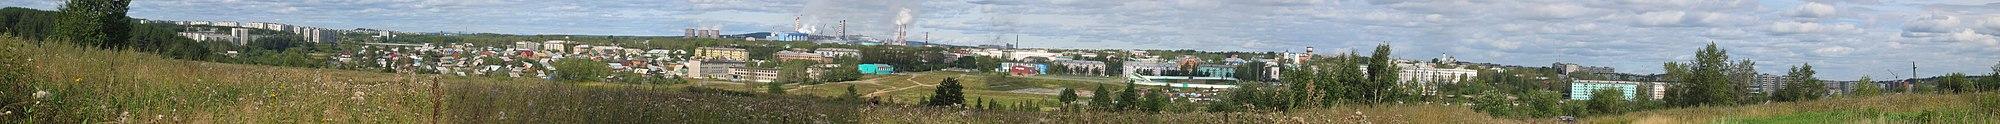 Панорама Краснотурьинска с противоположного берега реки Турьи.